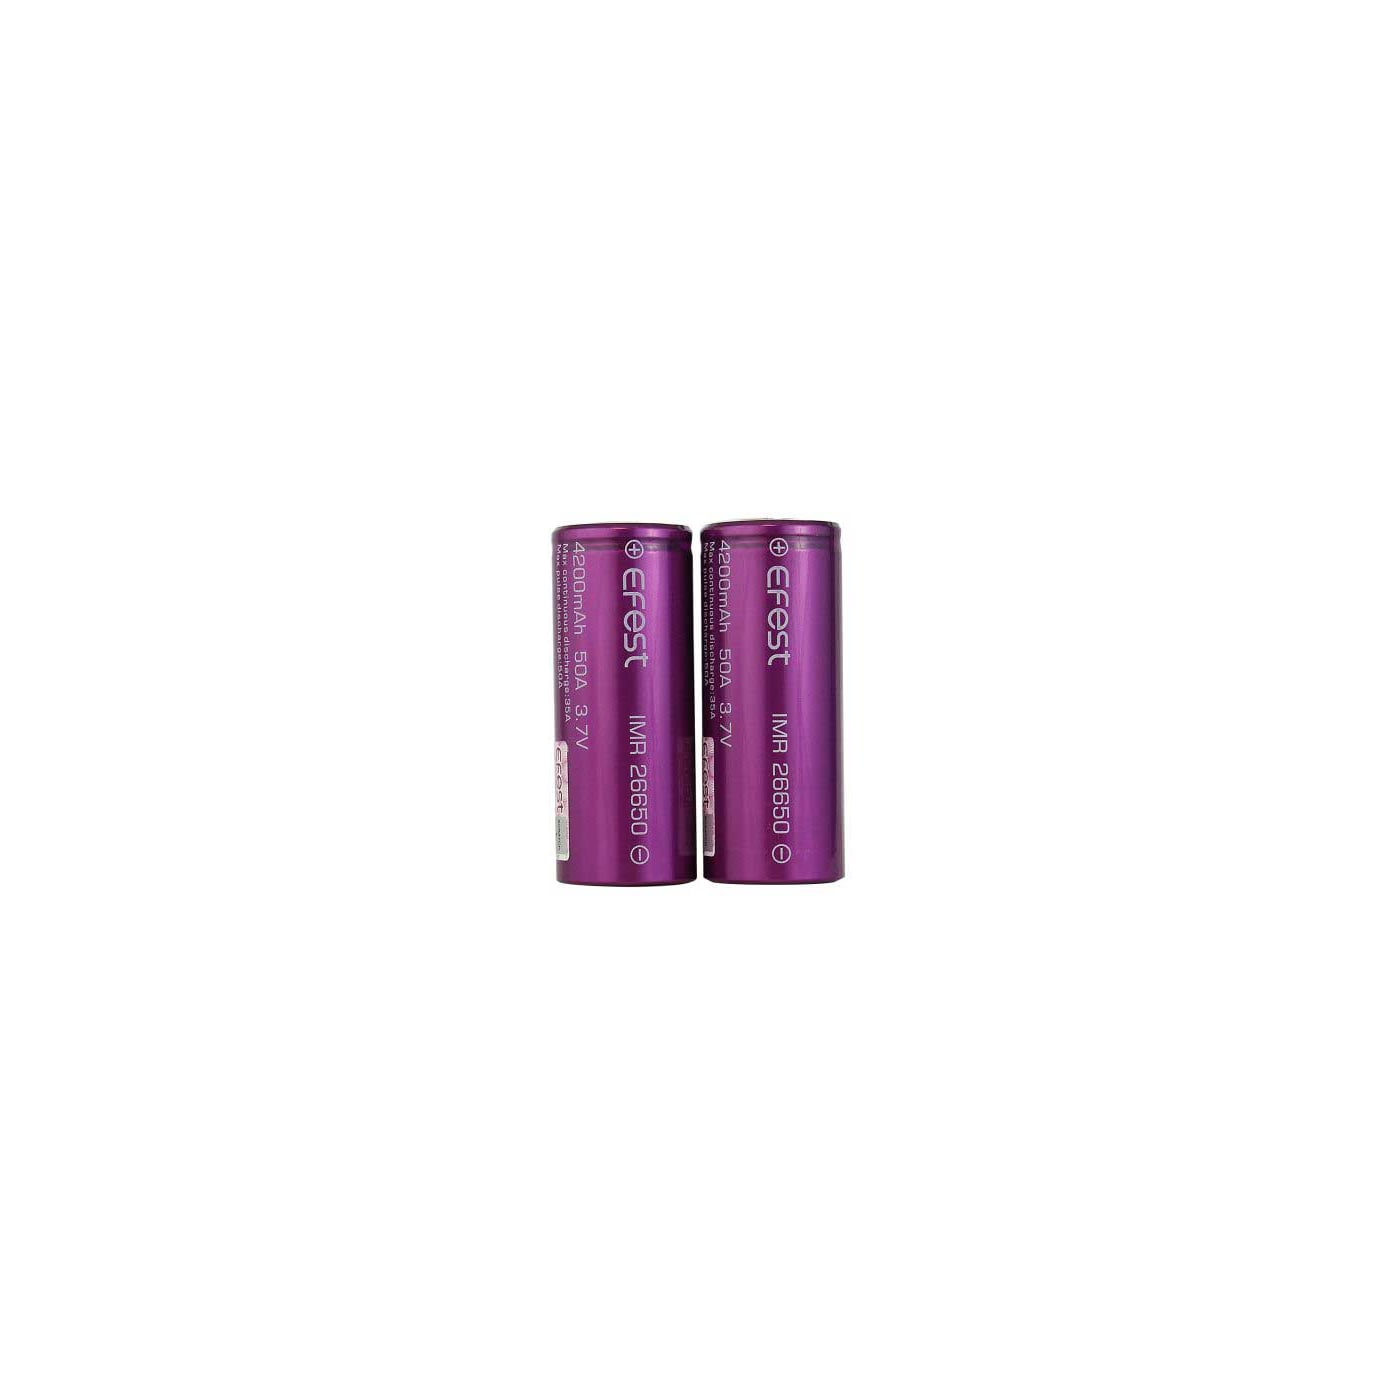 Efest IMR 50A 26650 Flat Top Battery 4200 mAh - 2 Pack